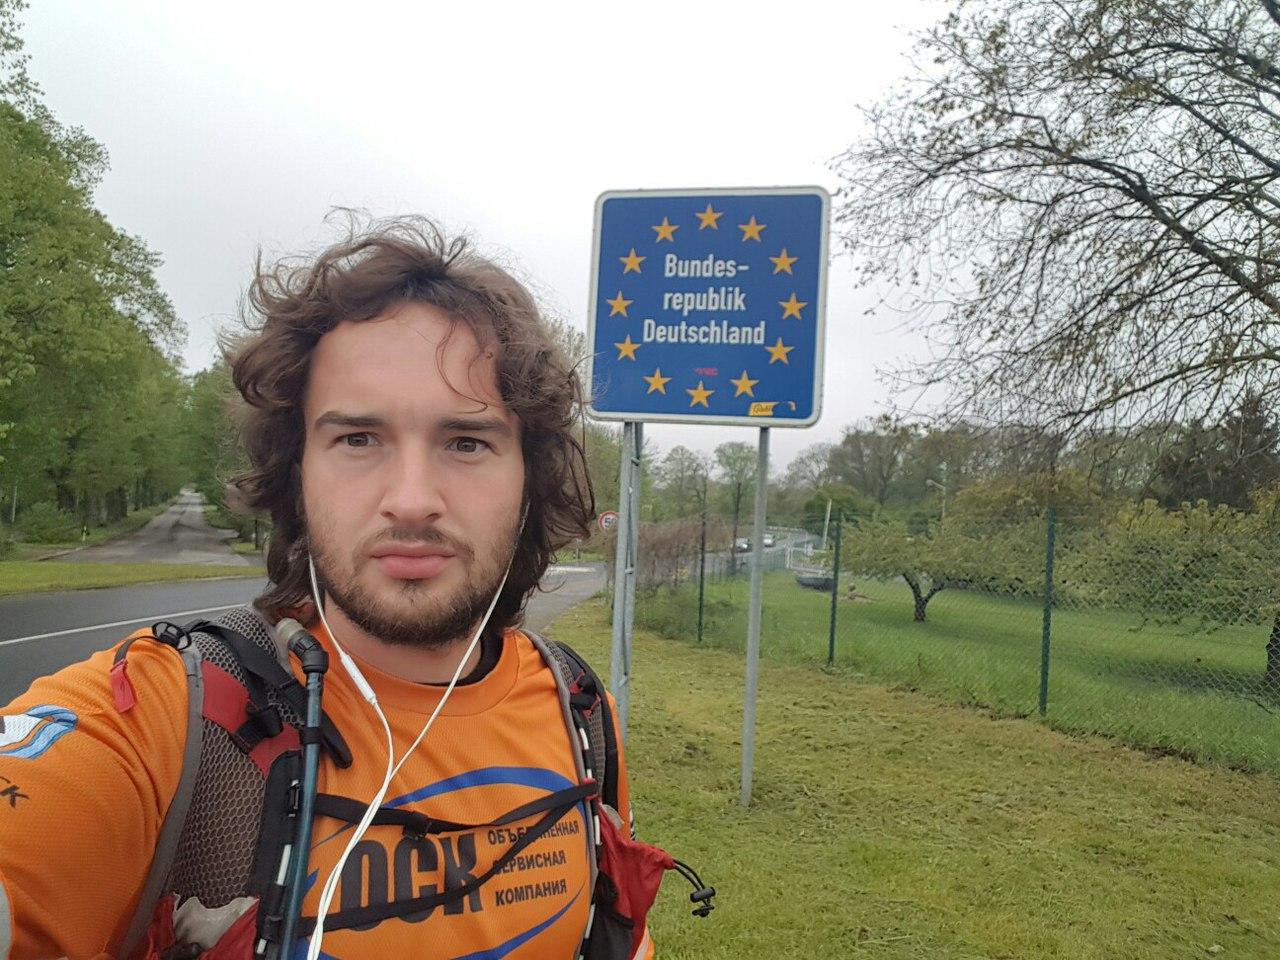 Бегун изМагнитогорска, стартовавший наМамаевом Кургане, финиширует вГермании